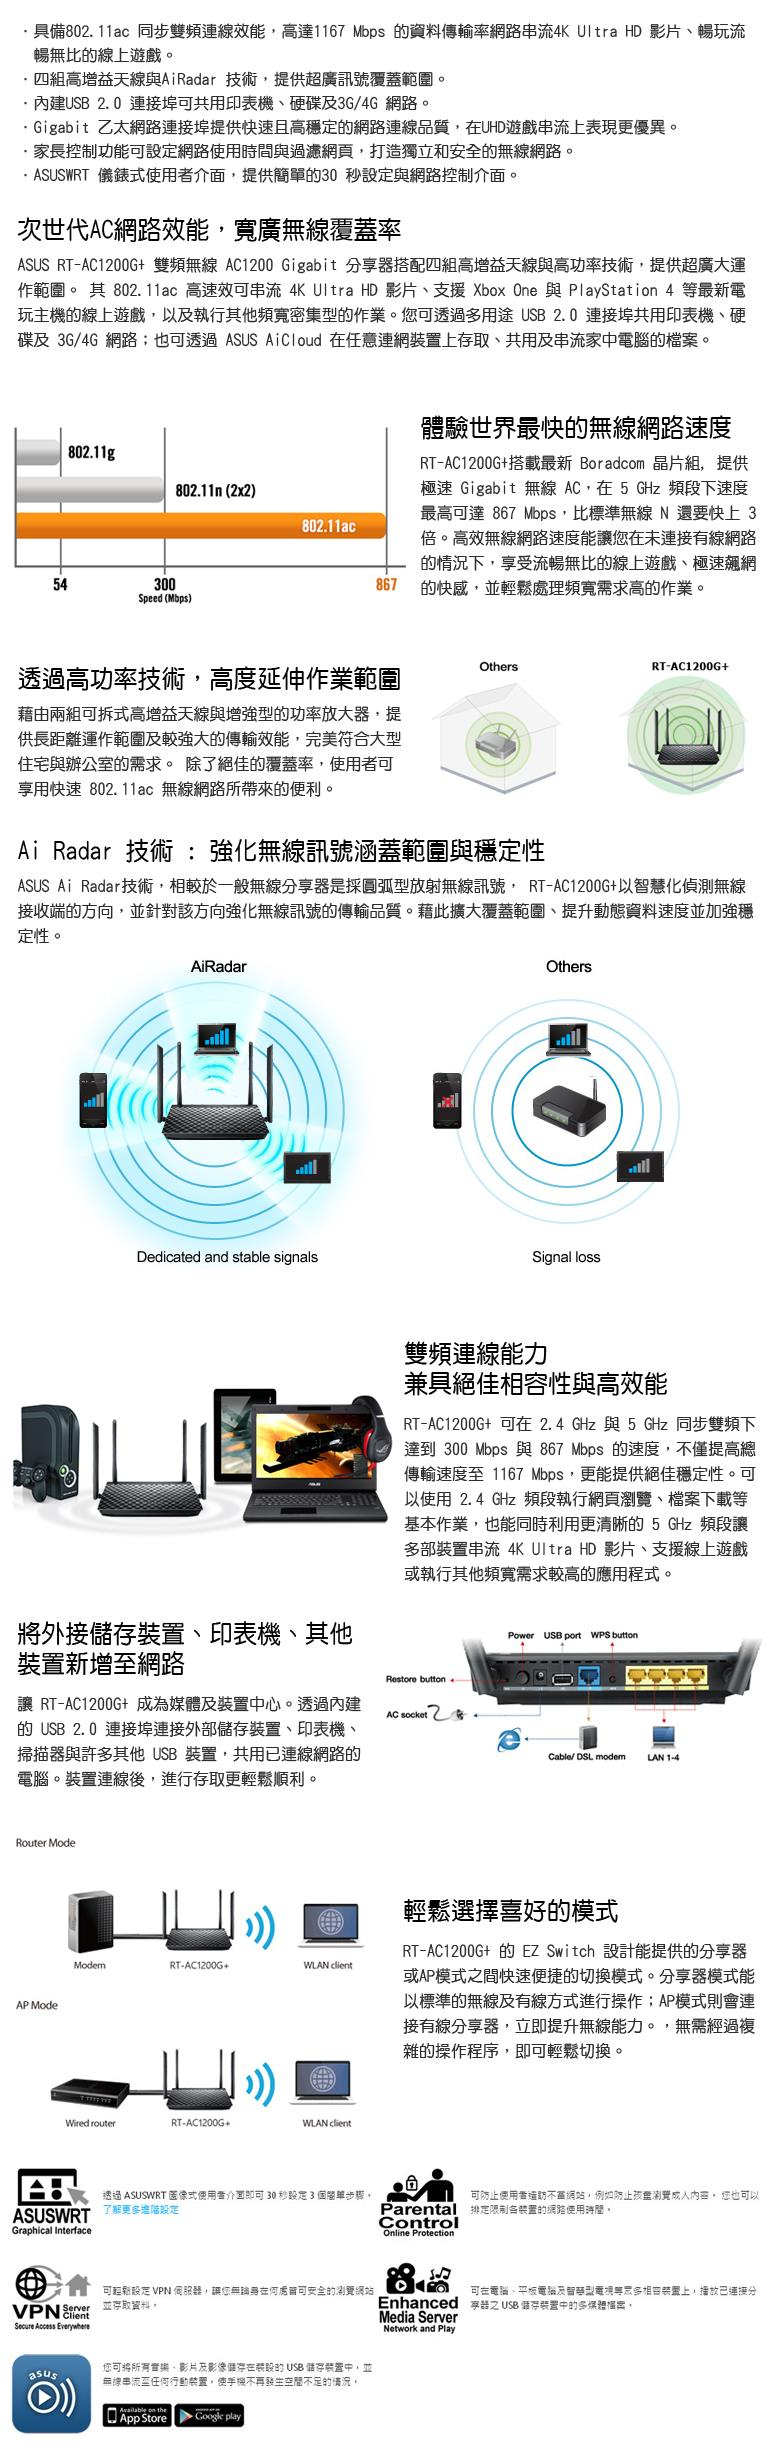 ASUS華碩RT-AC1200G PLUS無線分享器/無線路由器 EcLife良興購物網